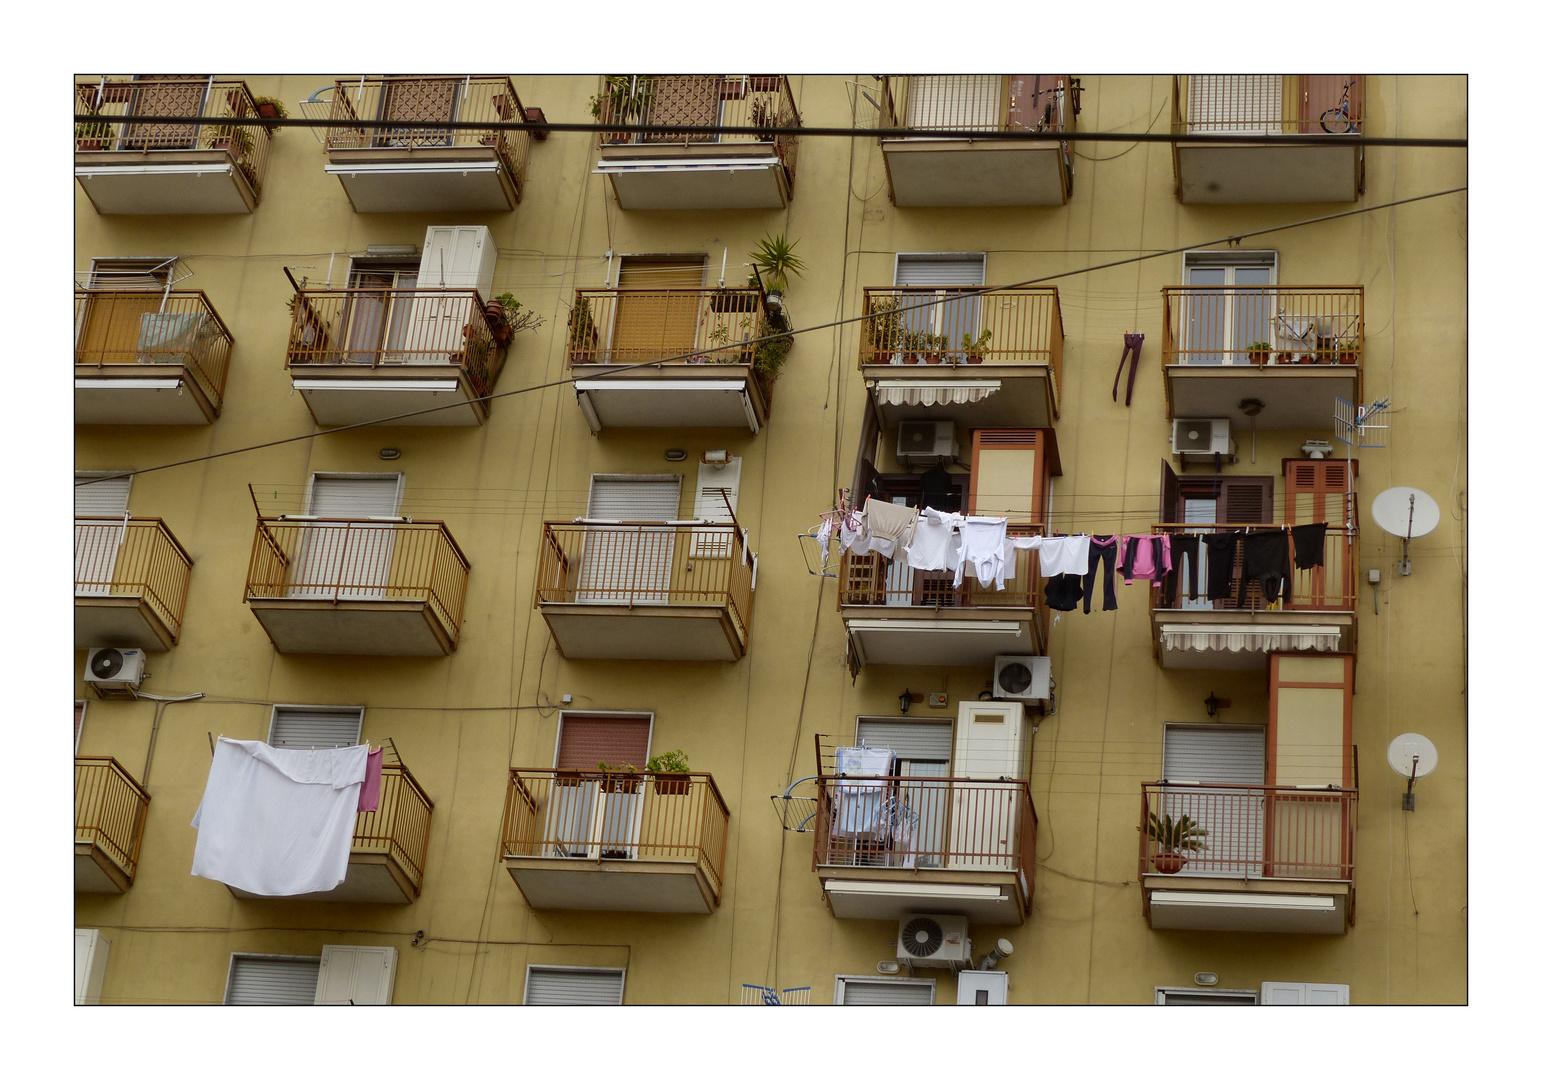 Impression aus Neapel 01